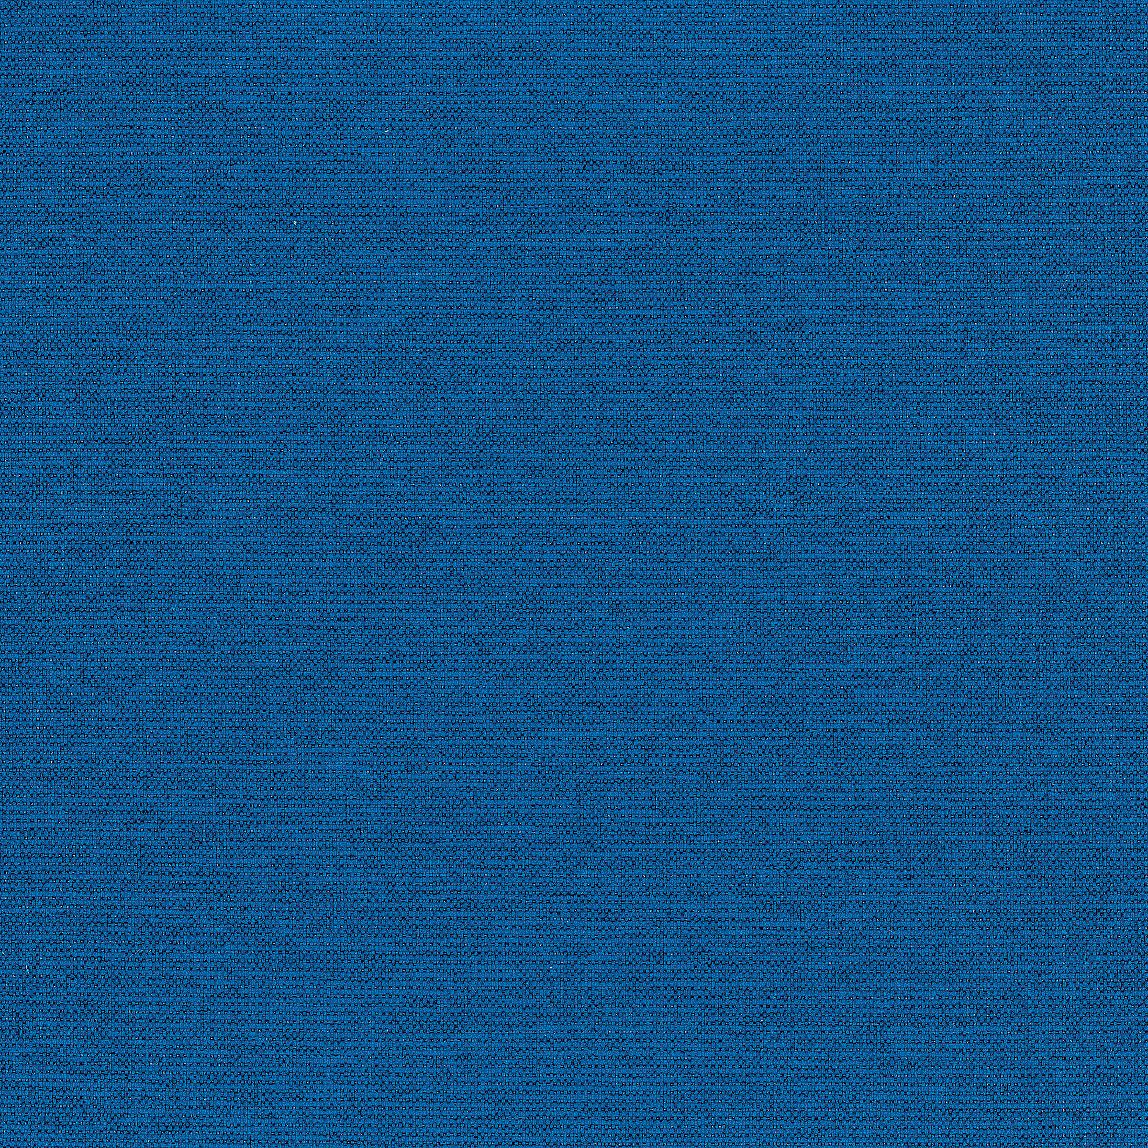 Dapper Sapphire Swatch